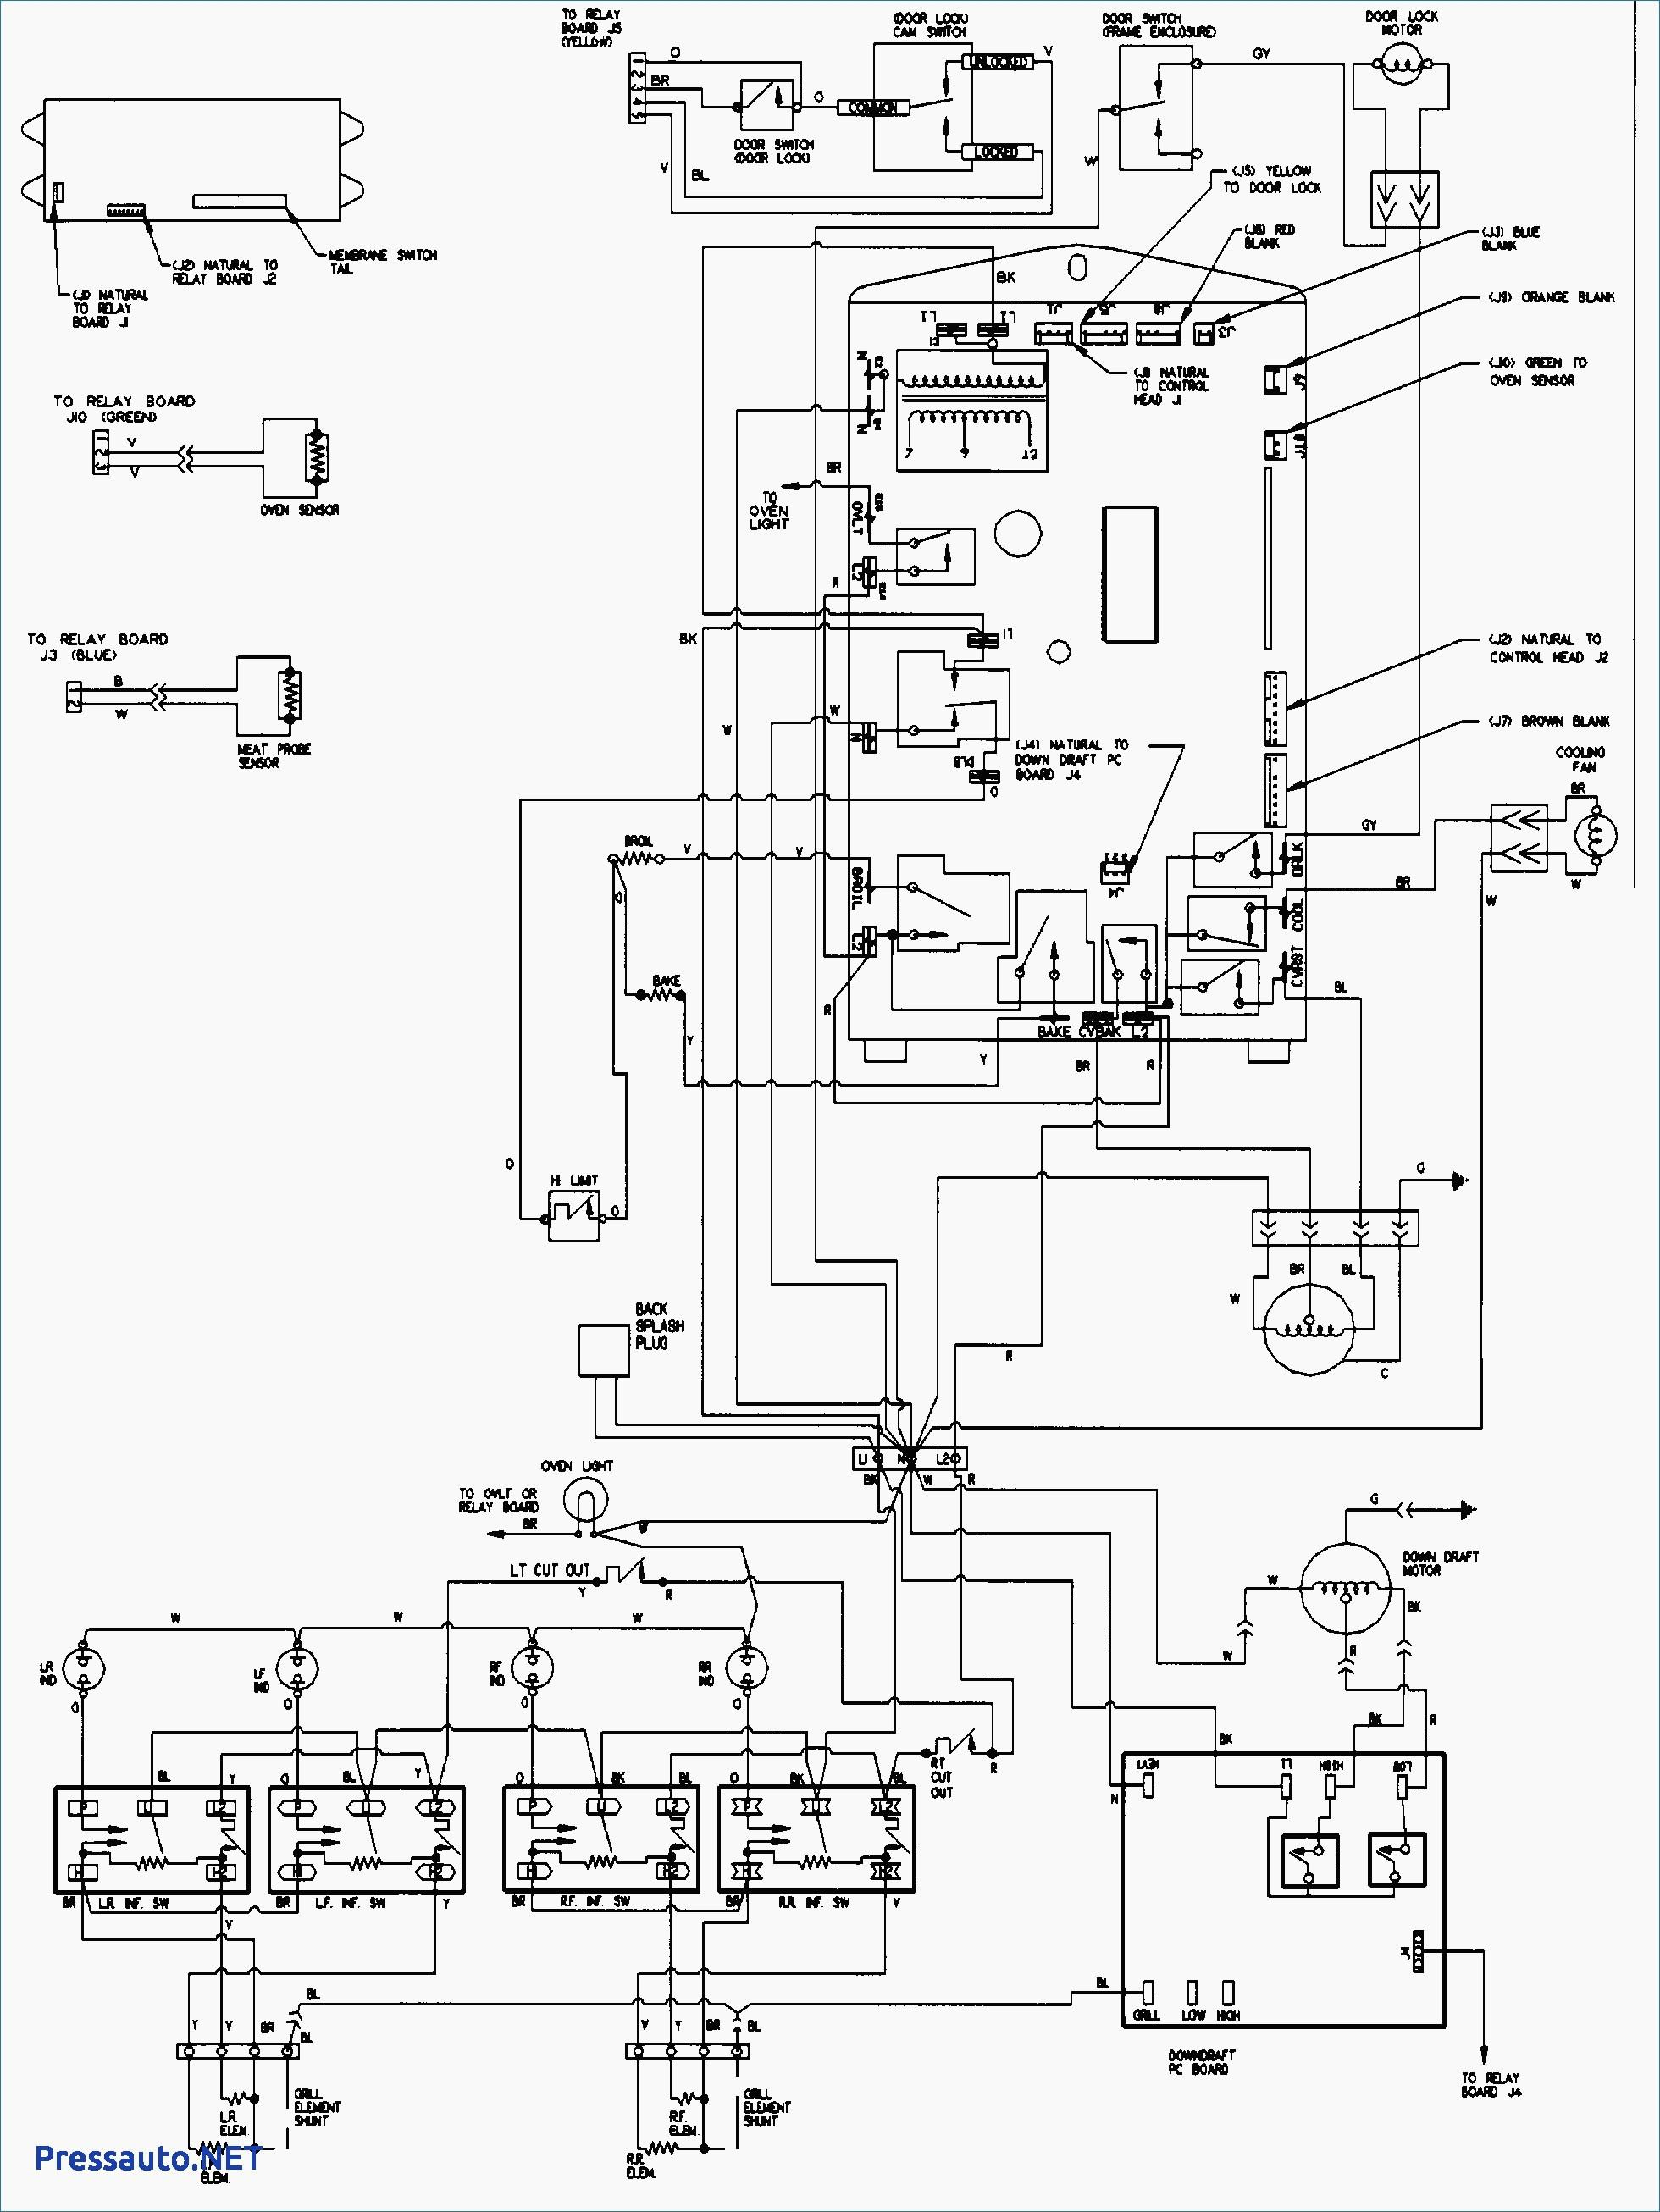 Intertherm Electric Furnace Wiring Diagram Unique Gas Furnace Wiring Ssu Wiring Diagrams